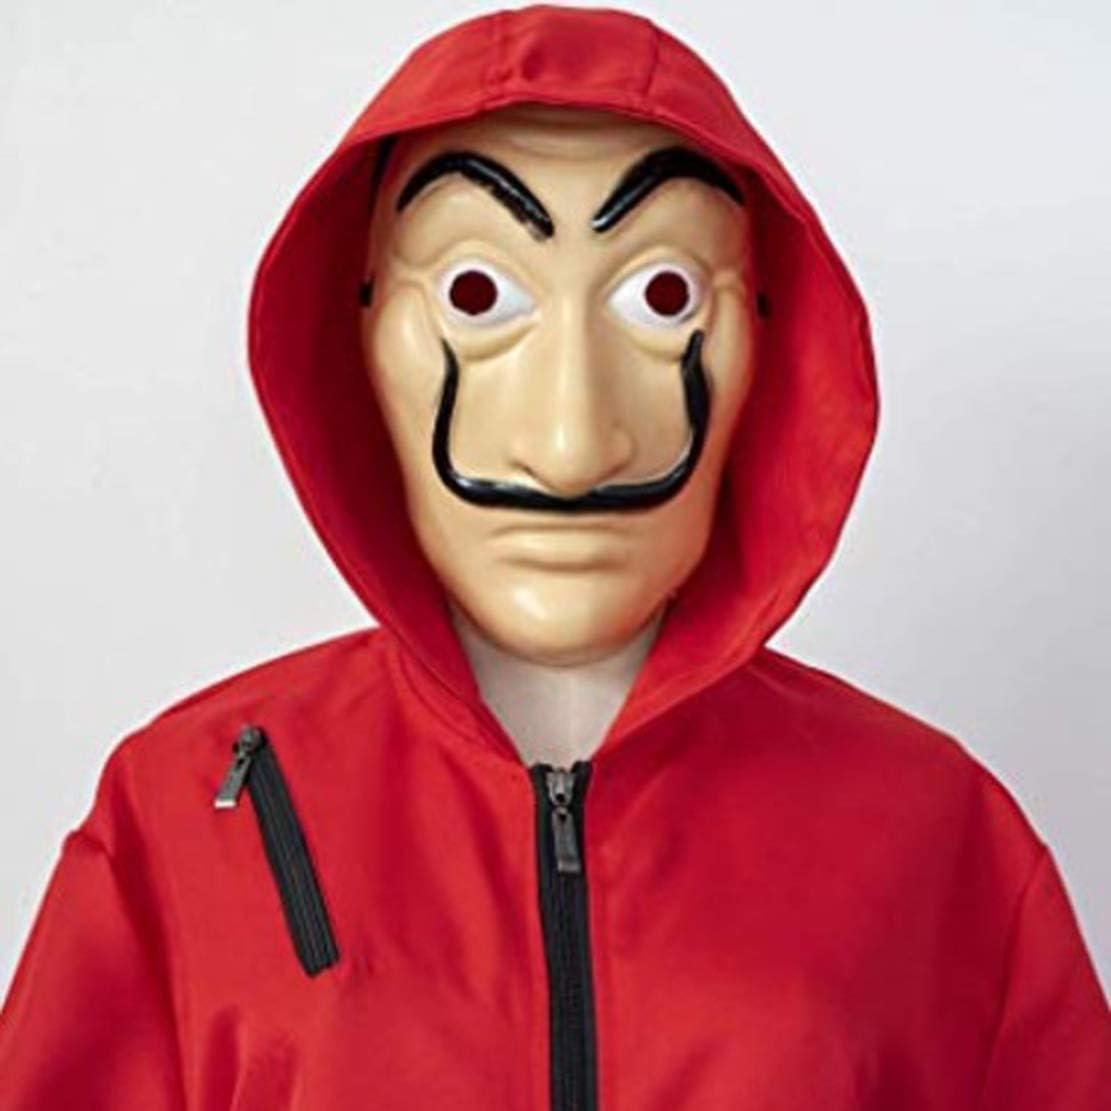 Maschera Tuta Cosplay,Casa di Carta Costumi Tuta da Adulto per Bambini Tuta Rossa Tuta di Halloween